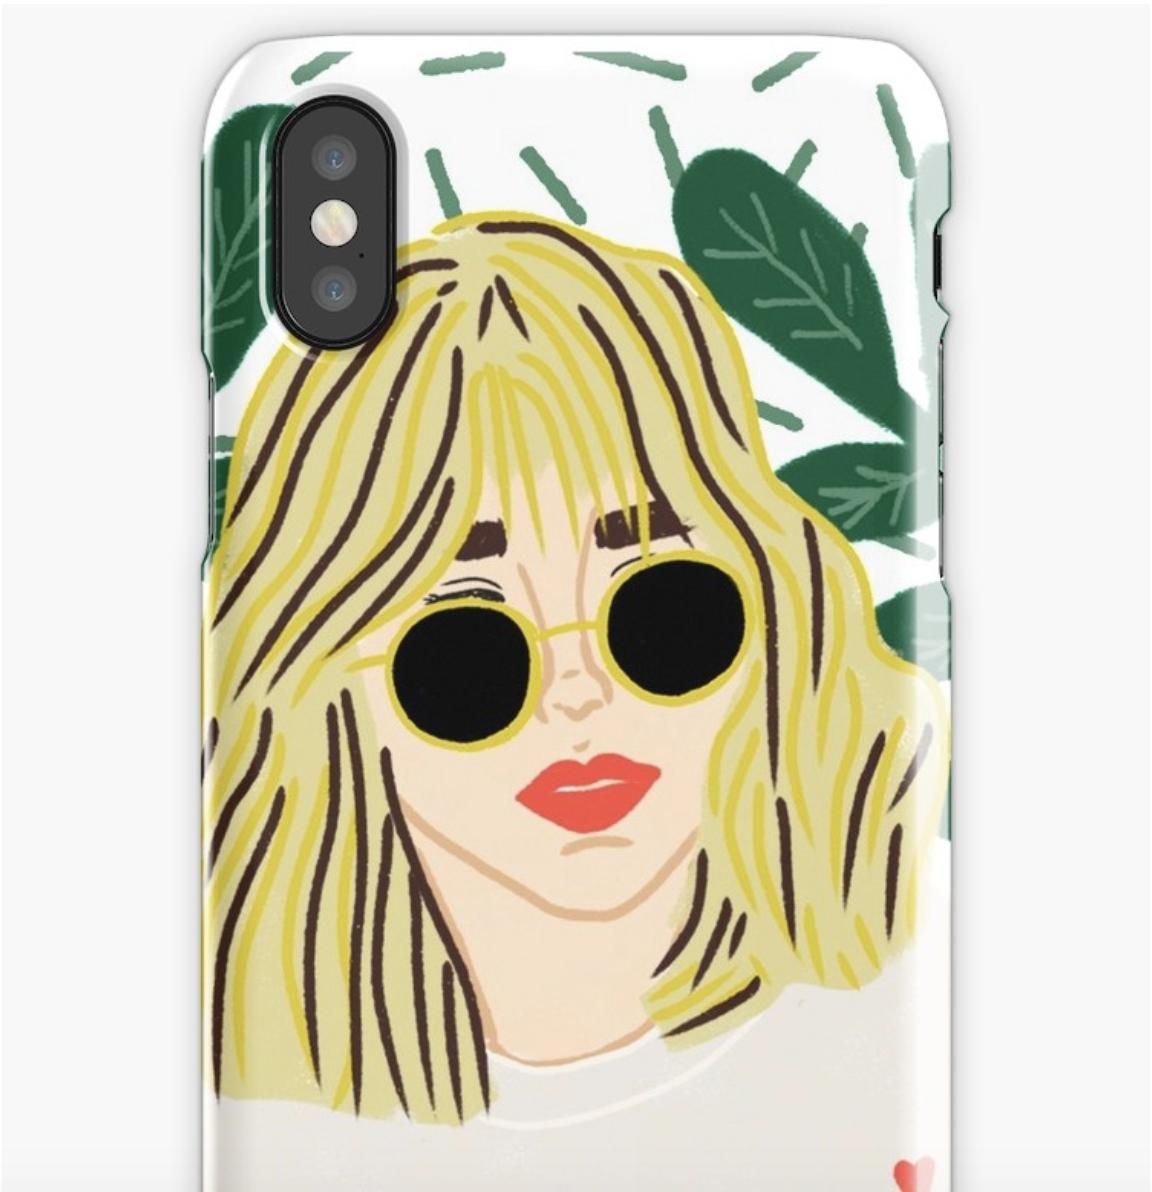 Sunglasses Girl - Phone Case